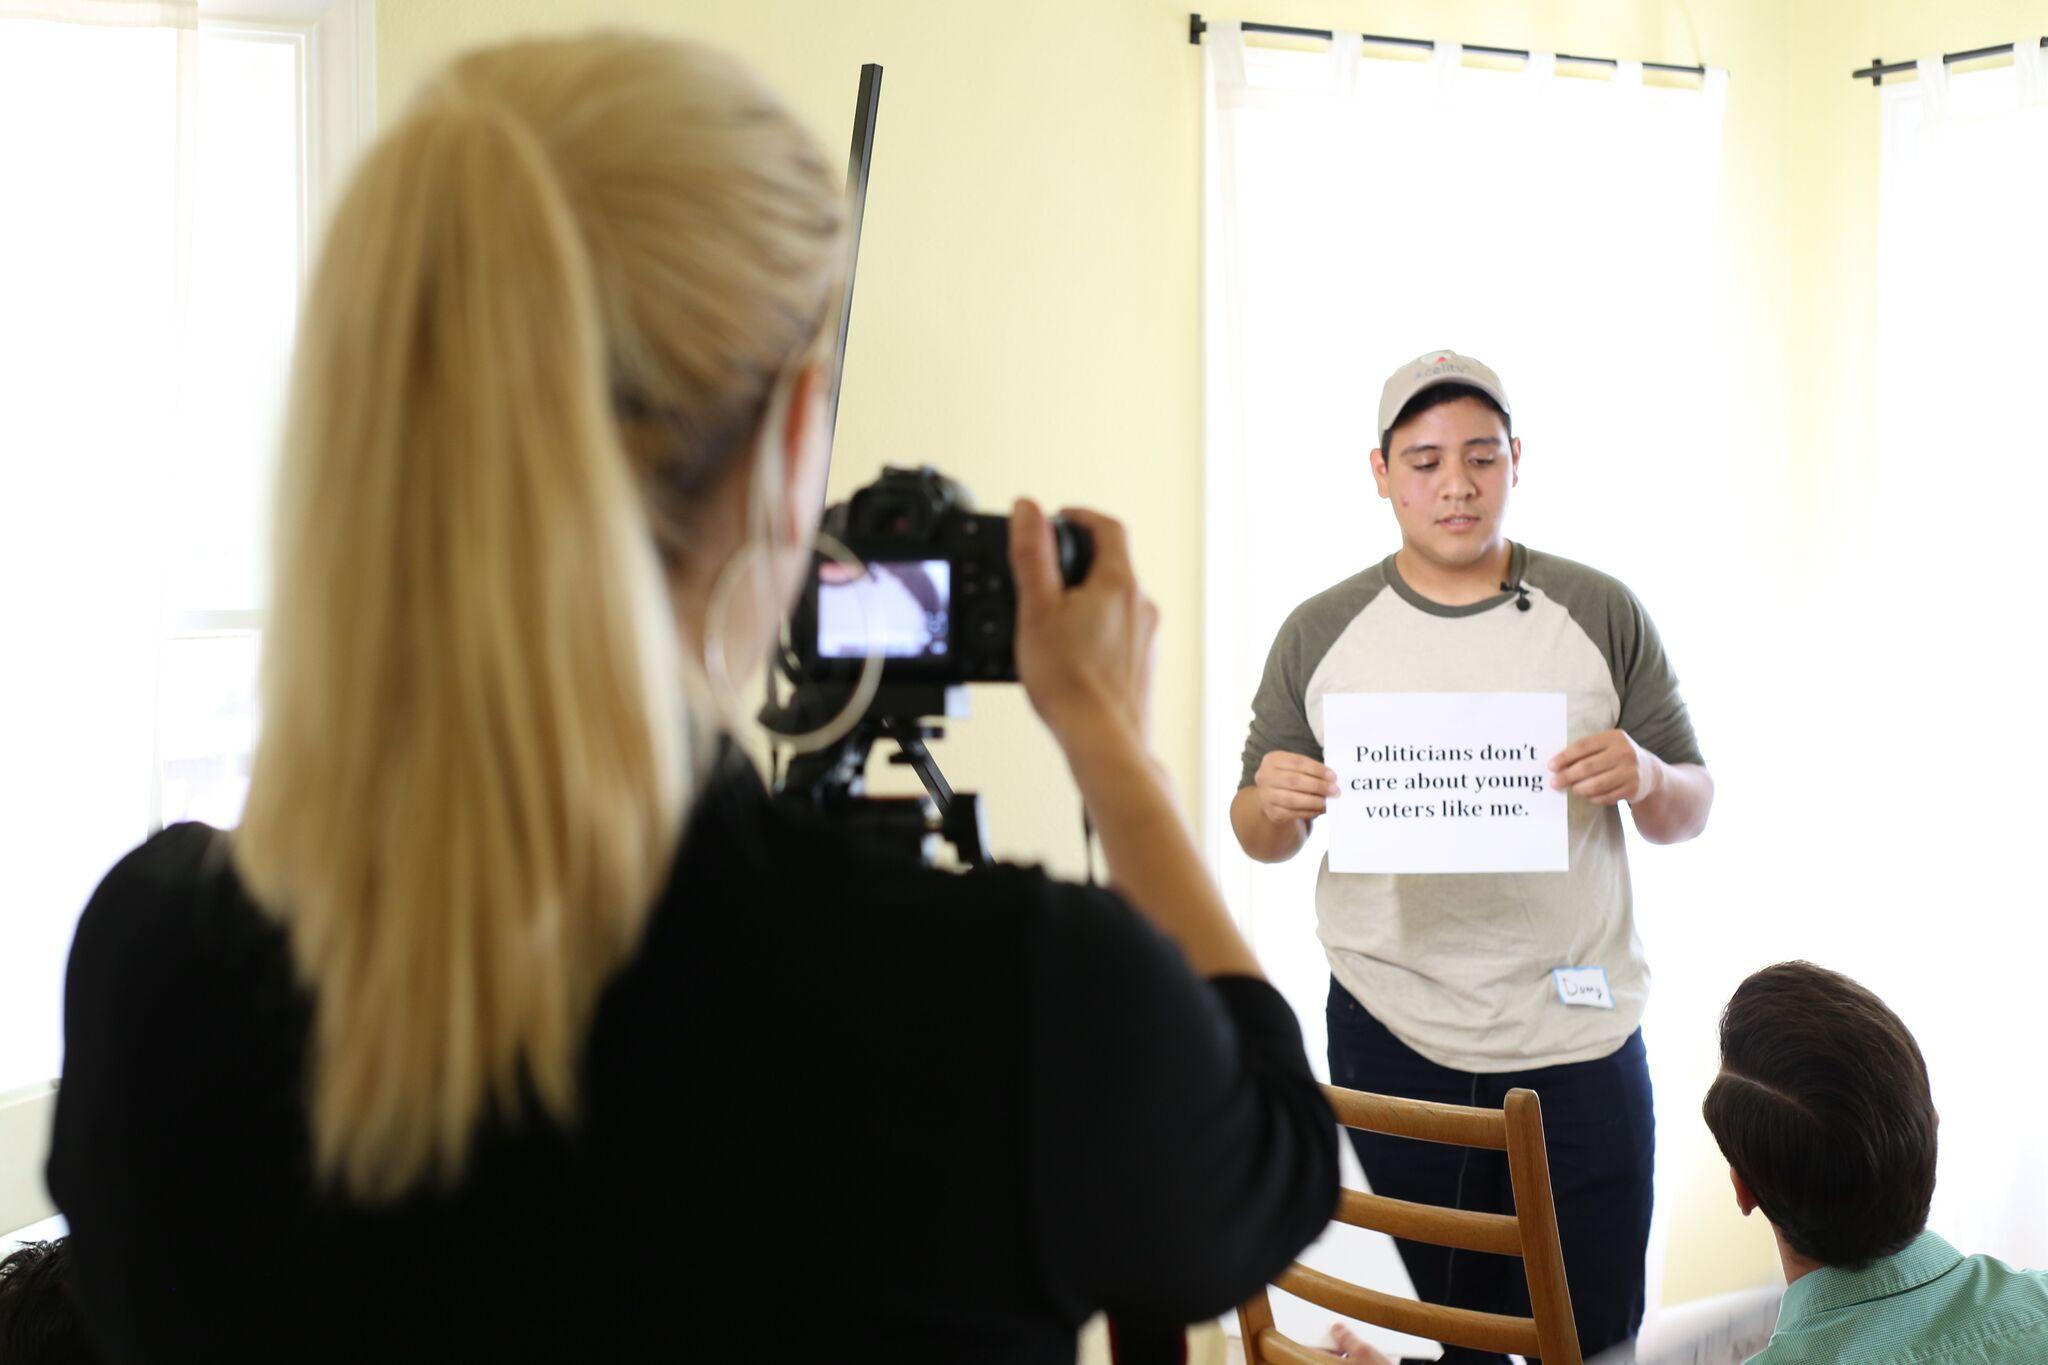 Laura Varela and Daniel Castillo at the GET REEL 1 Film Shoot on March 24, 2016. Photo by Arlene Mejorado